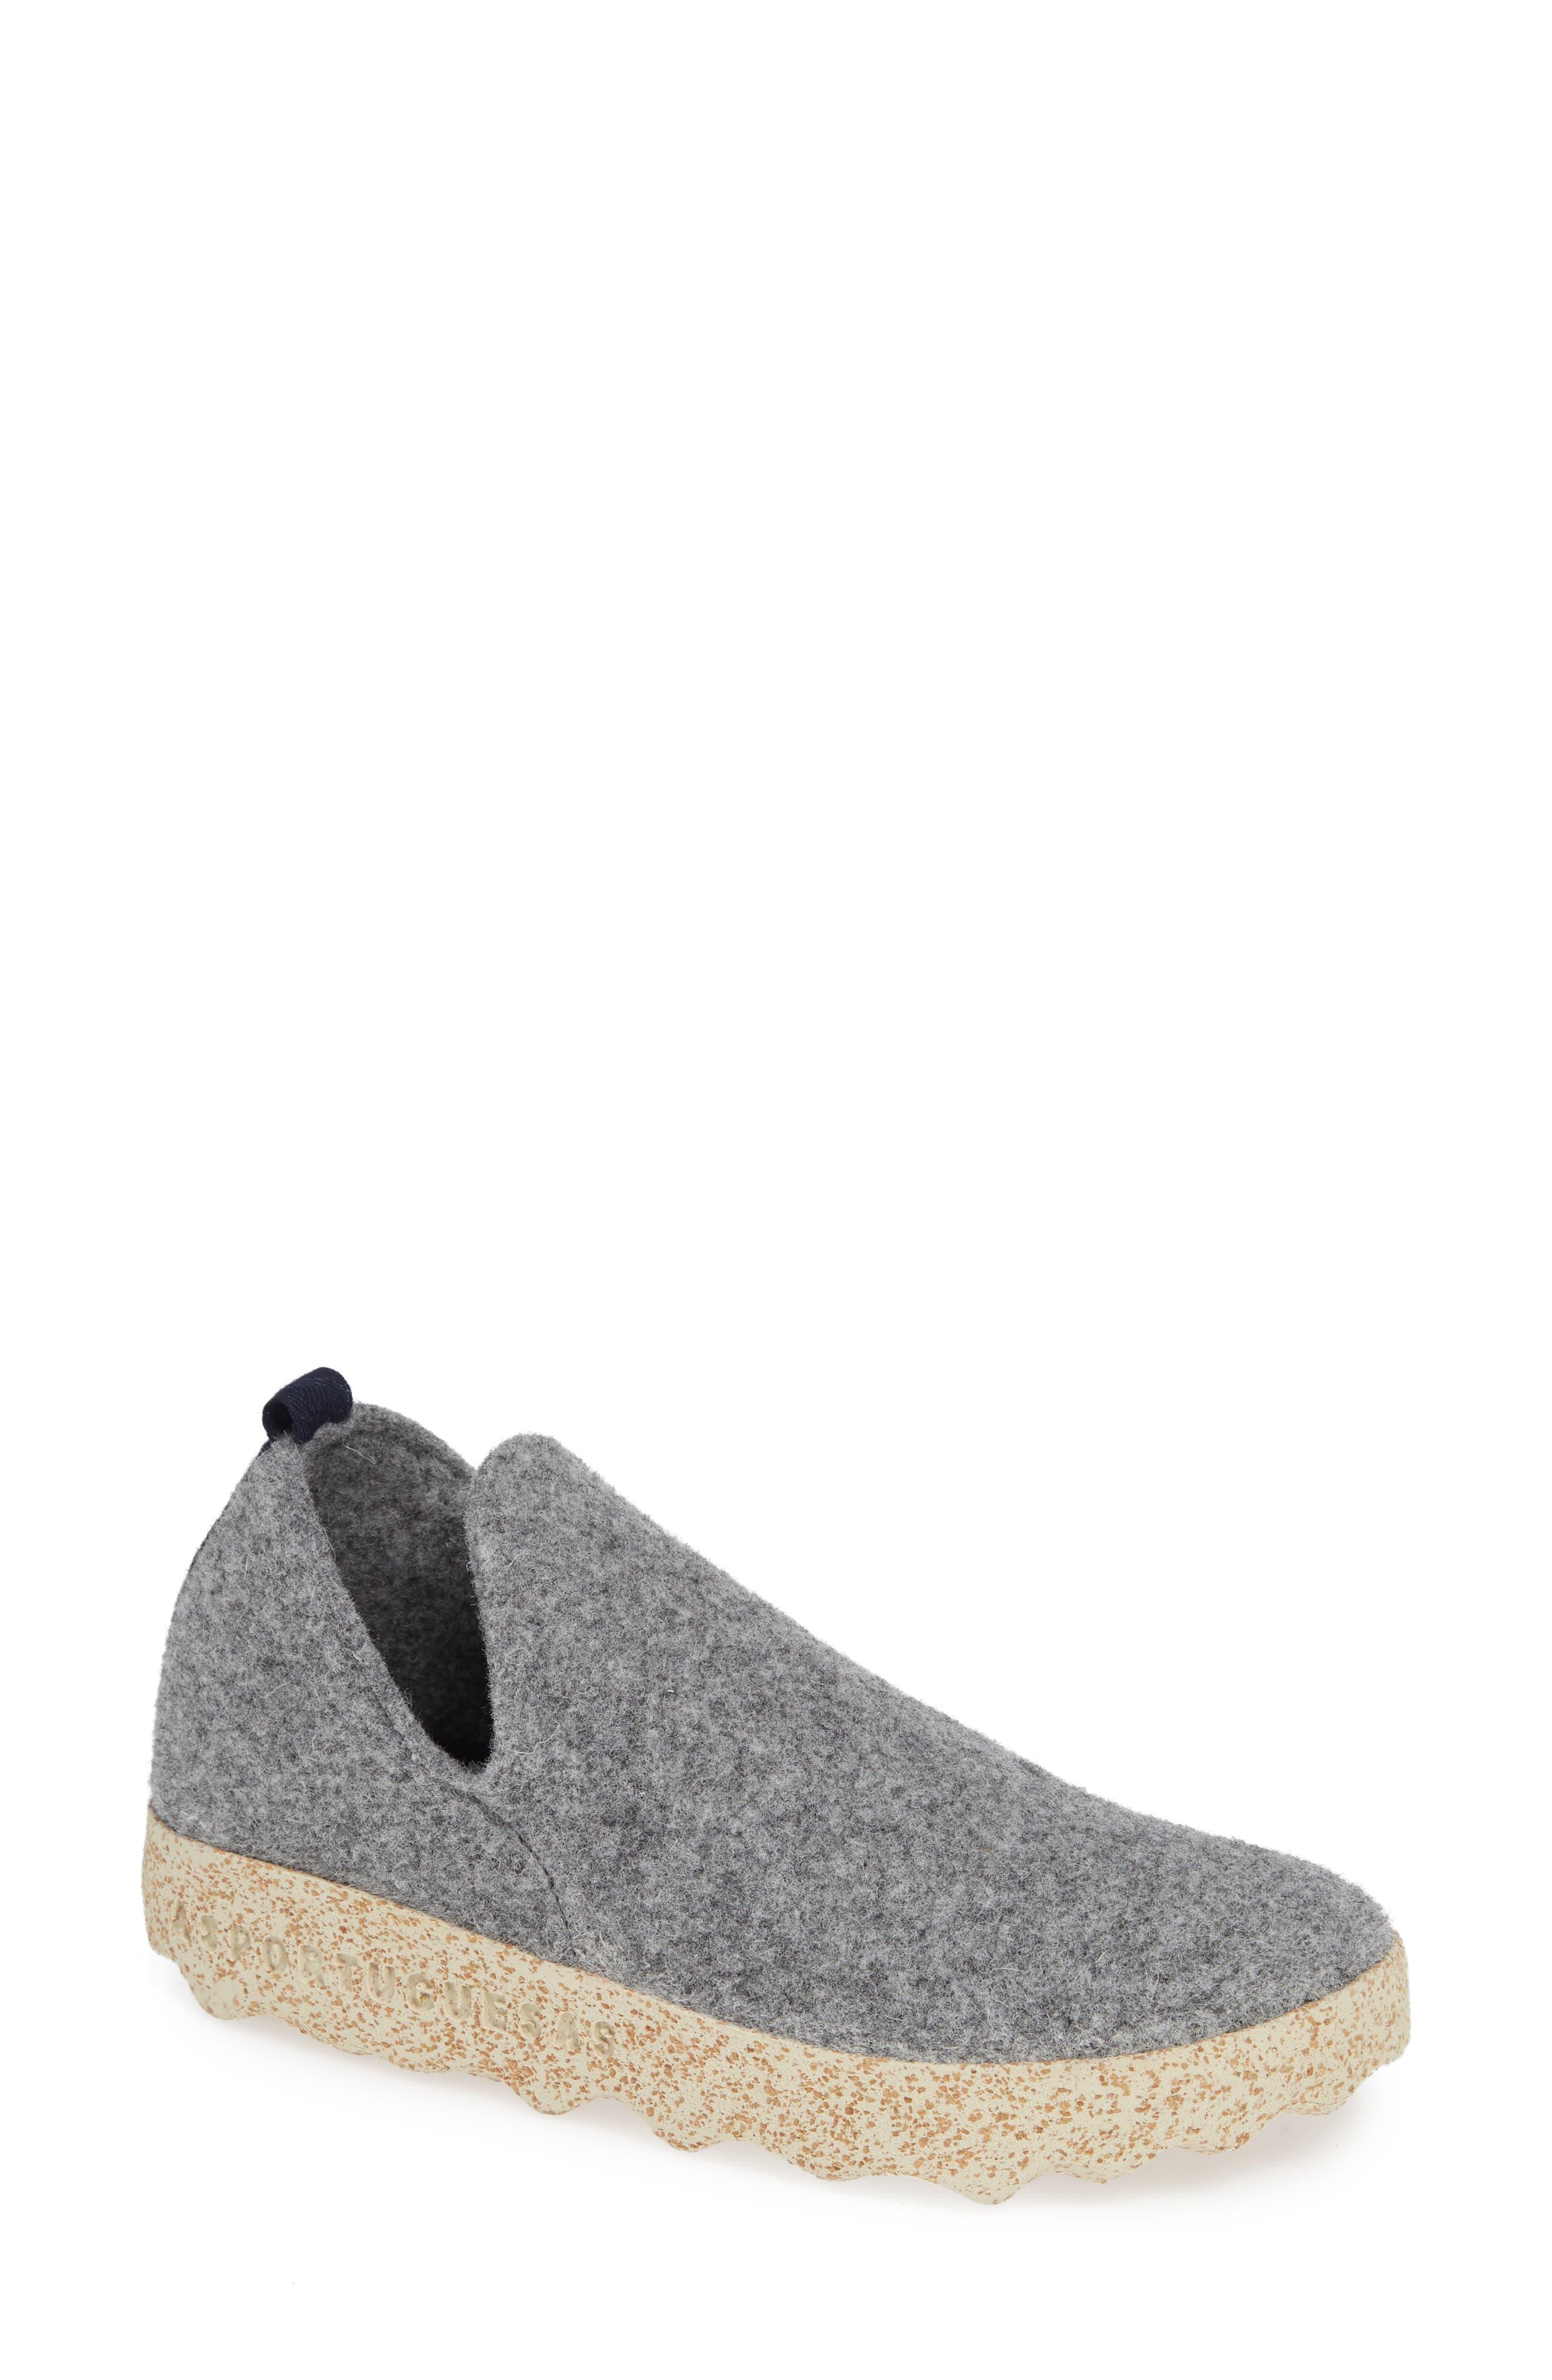 Asportuguesas By Fly London City Sneaker - Grey